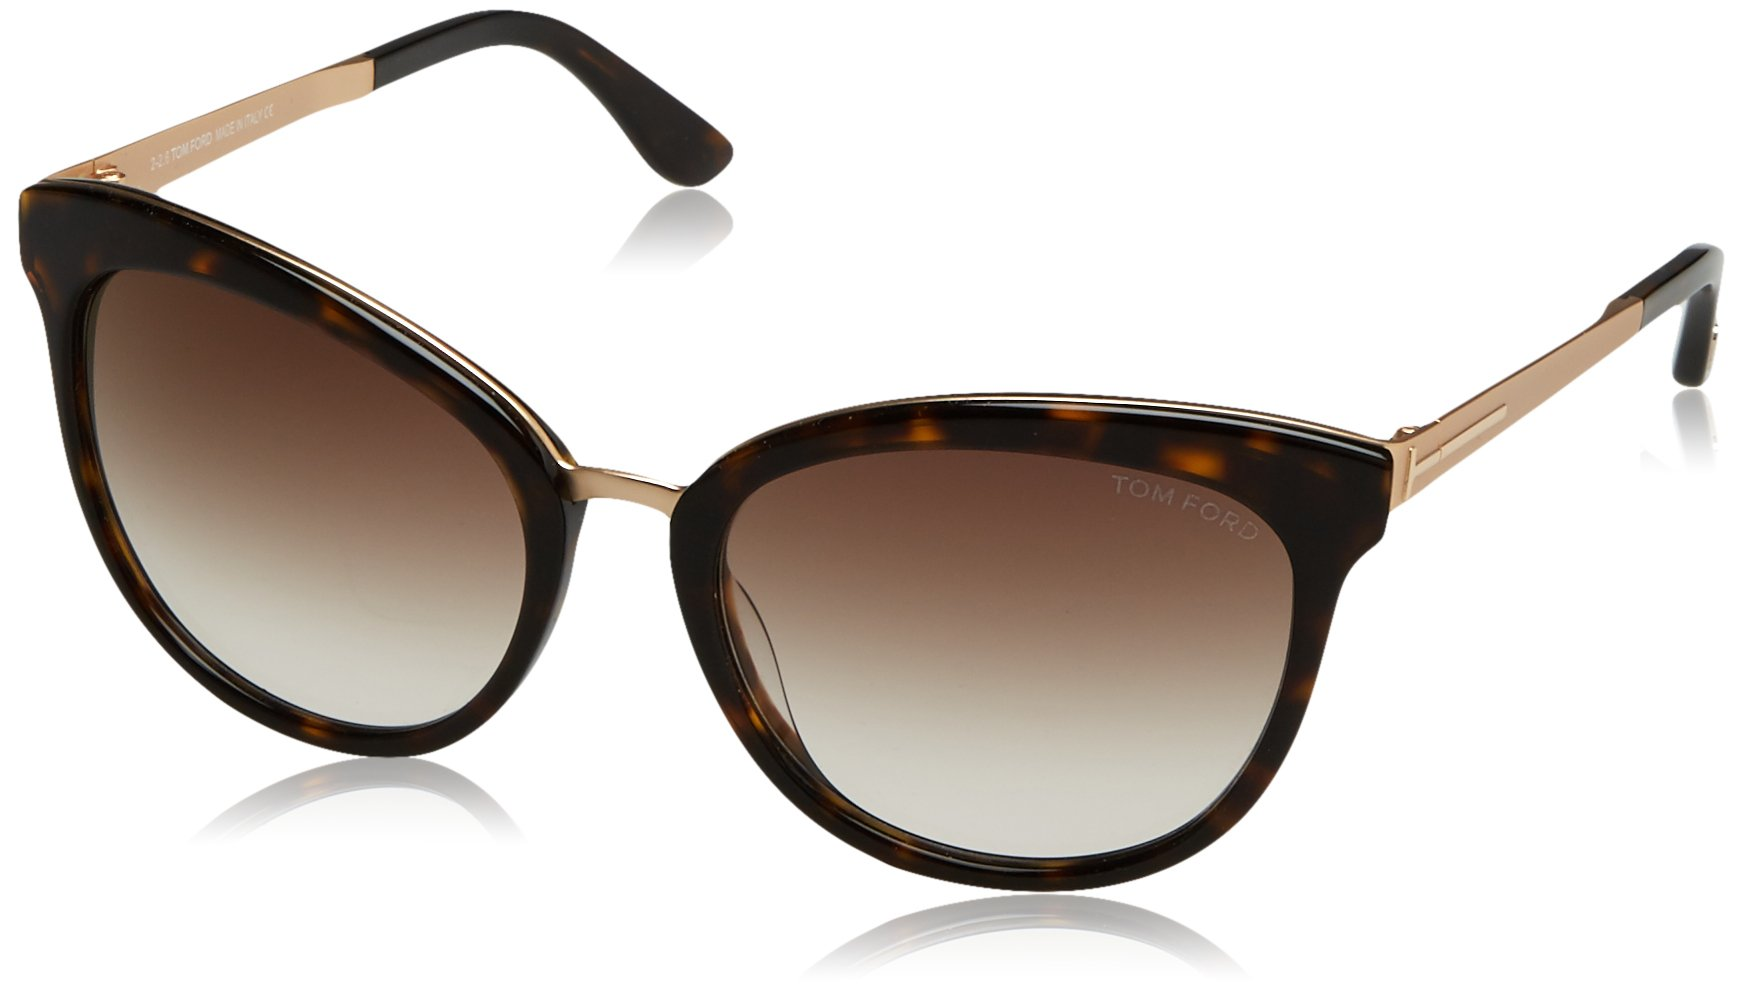 Tom Ford Emma 52G Tortoise / Gold Emma Cats Eyes Sunglasses Lens Category 2 Siz